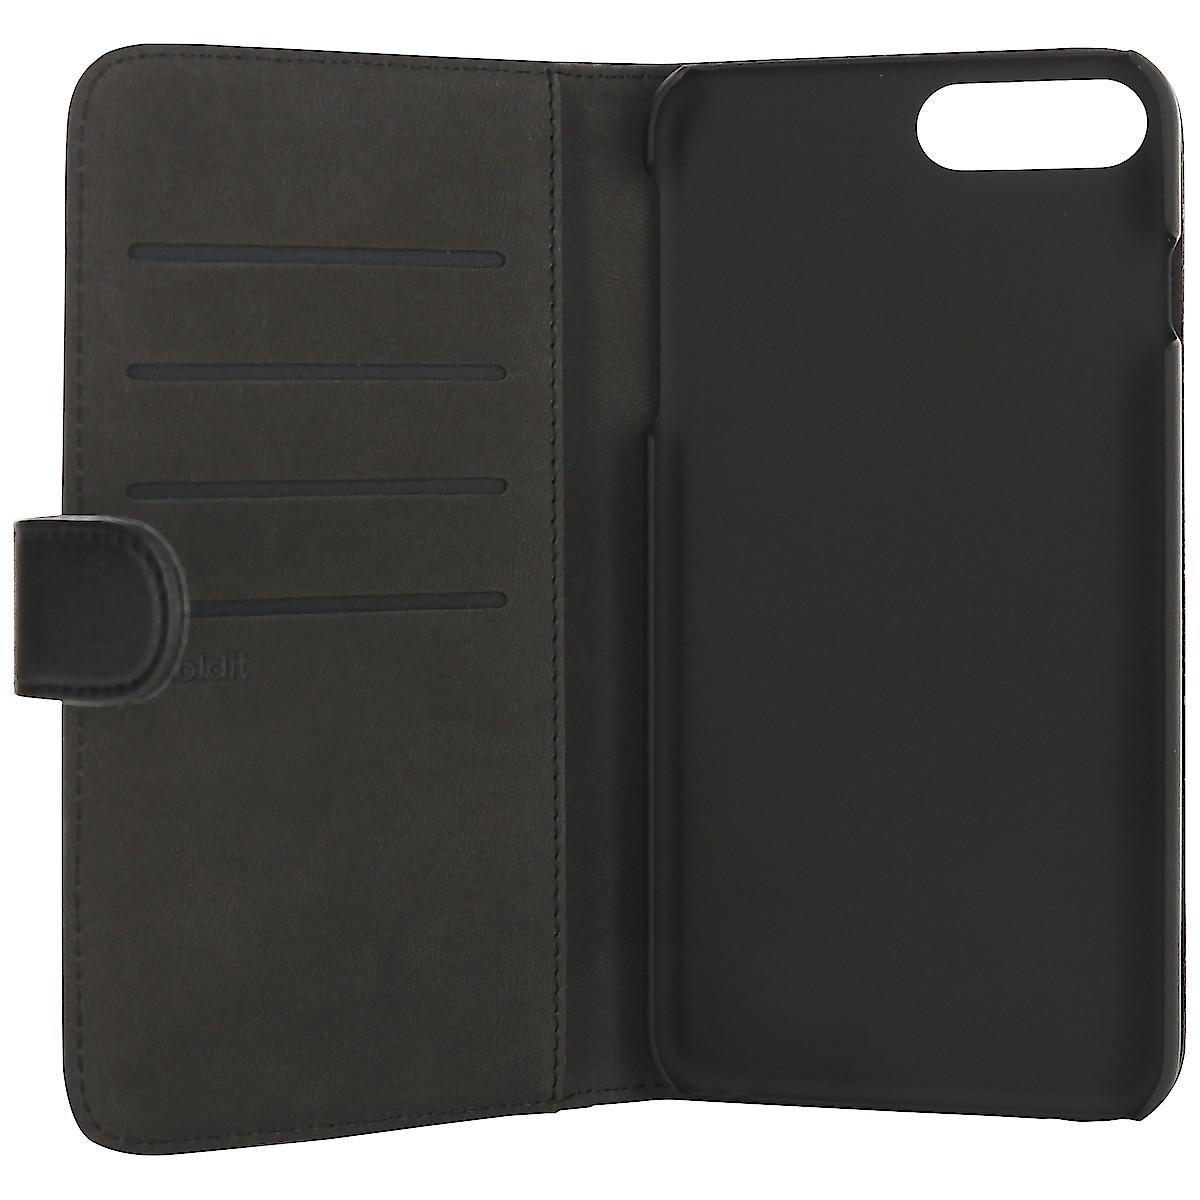 Taschenportemonnaie für iPhone 6 Plus/6s Plus/7 Plus/8 Plus, Holdit